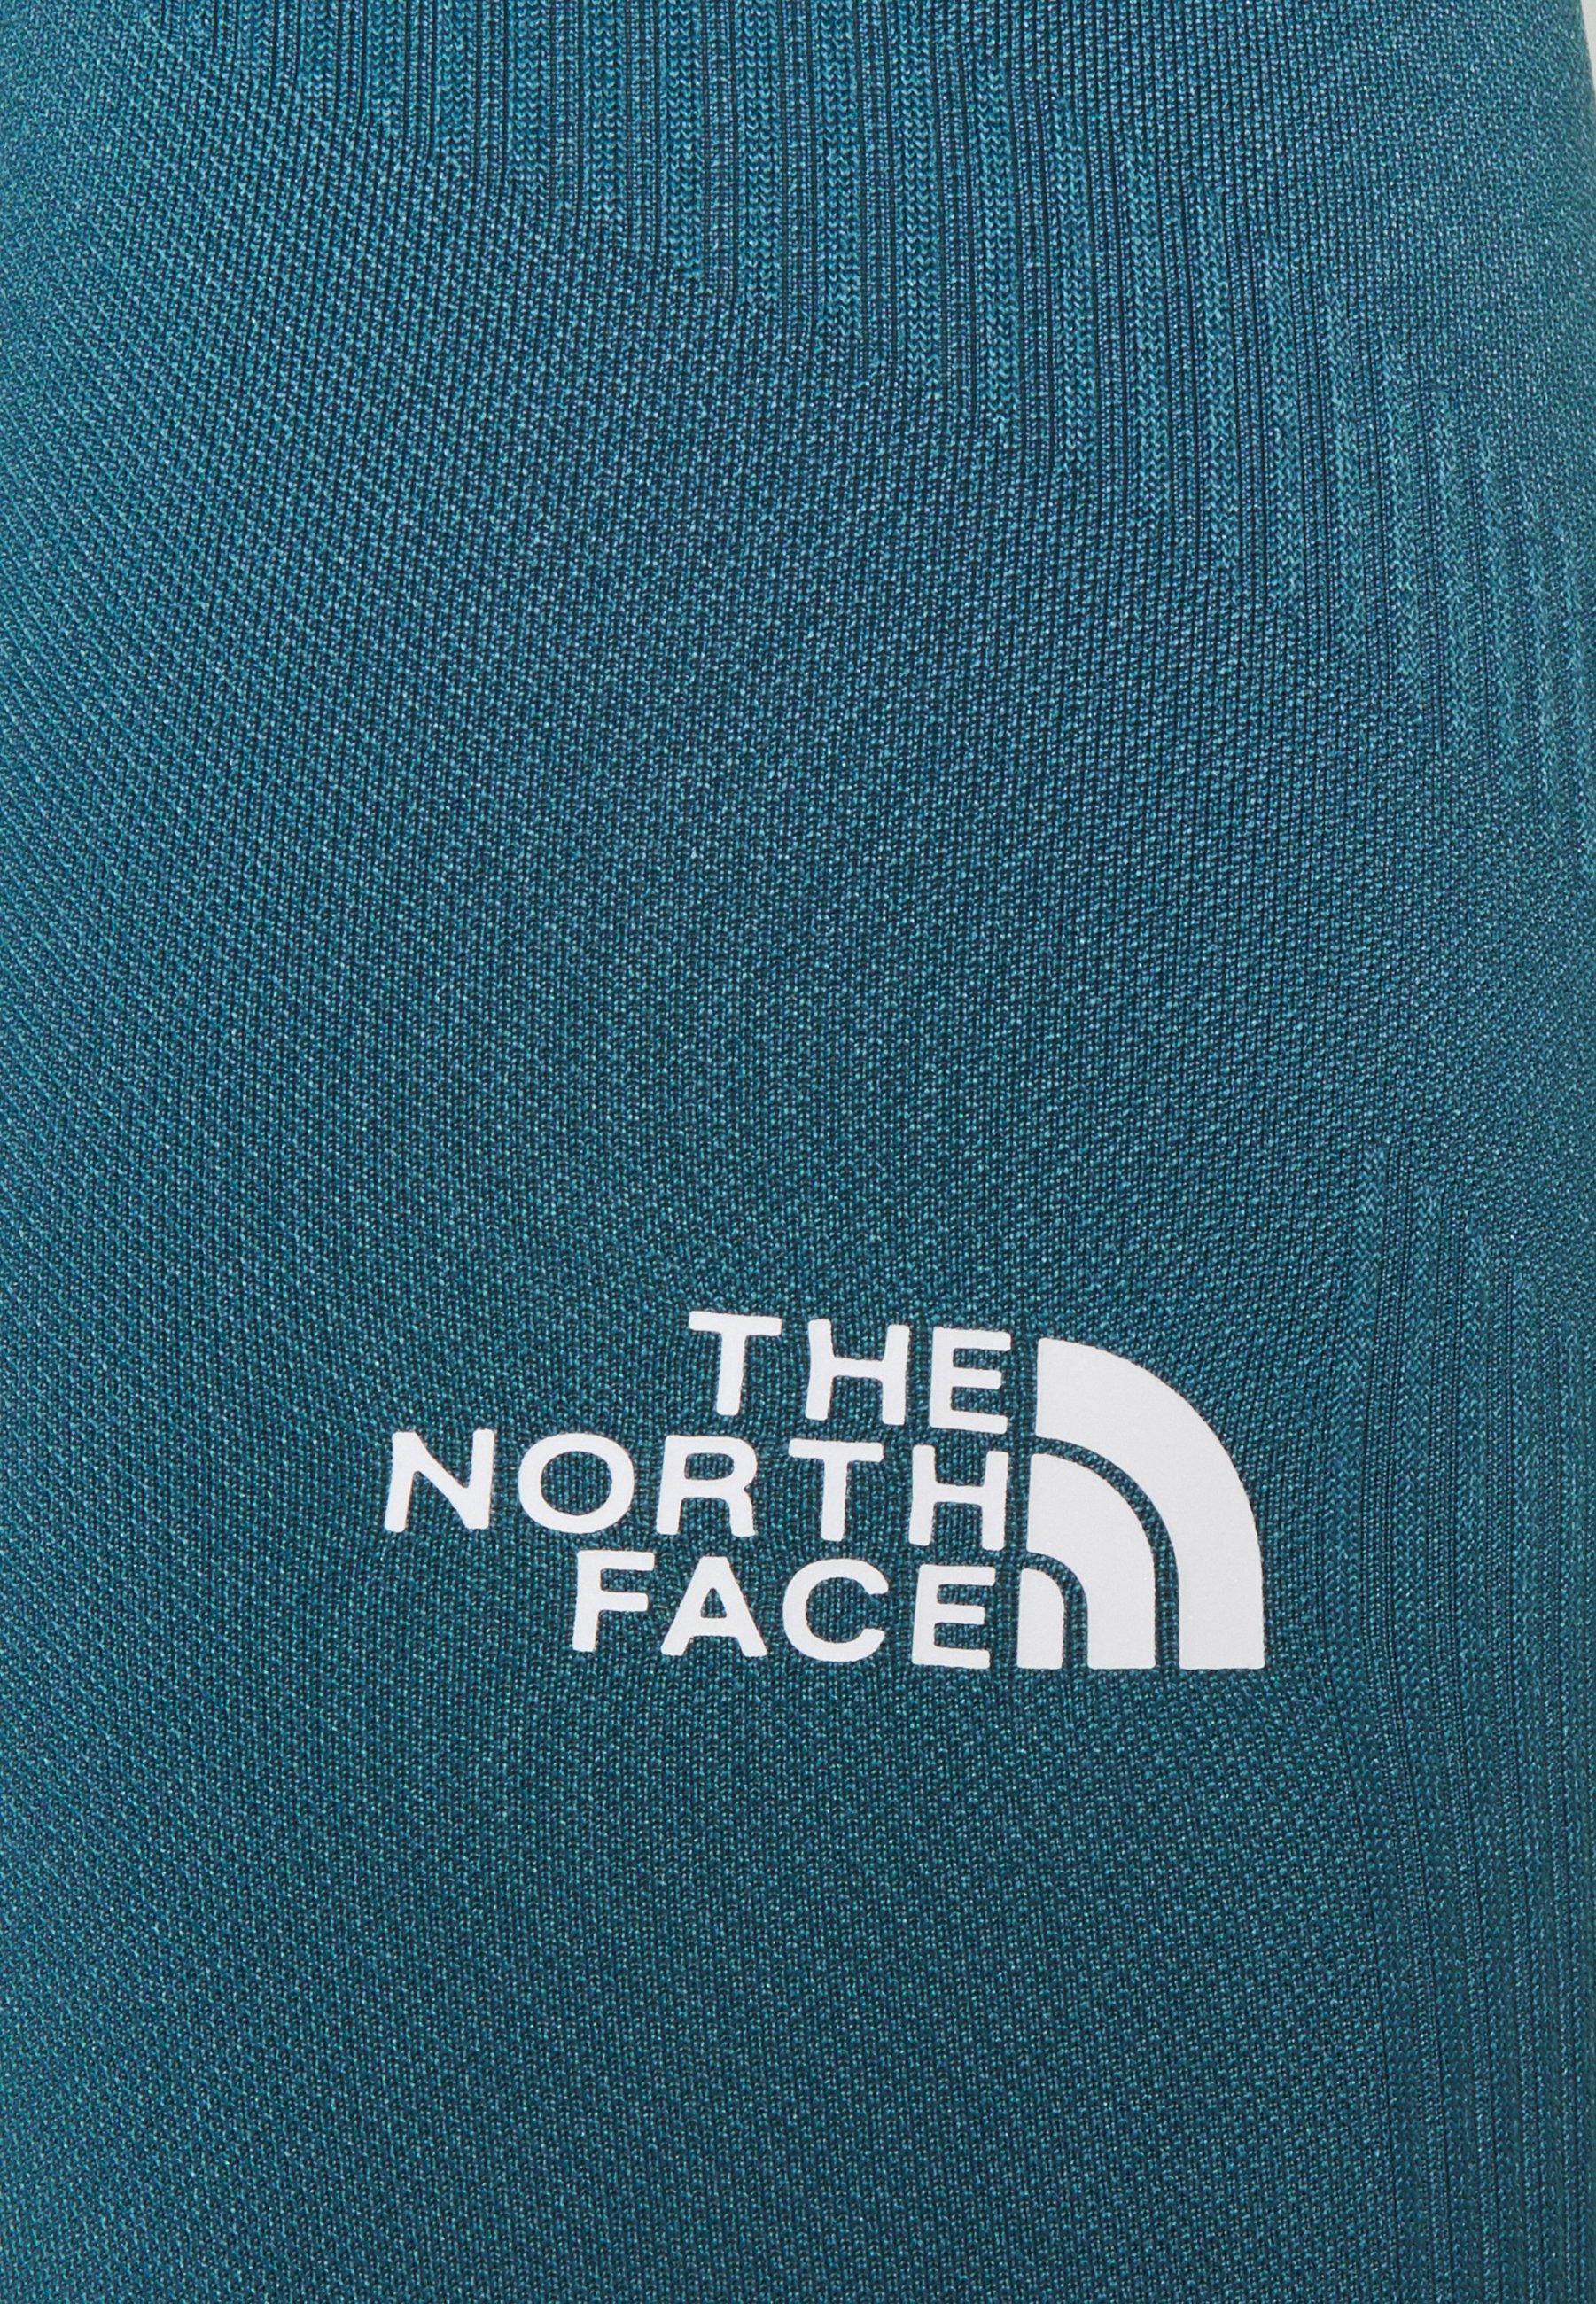 Get The Latest Fashion Women's Clothing The North Face TEKNITCAL Leggings mallard blue nfHeneiz0